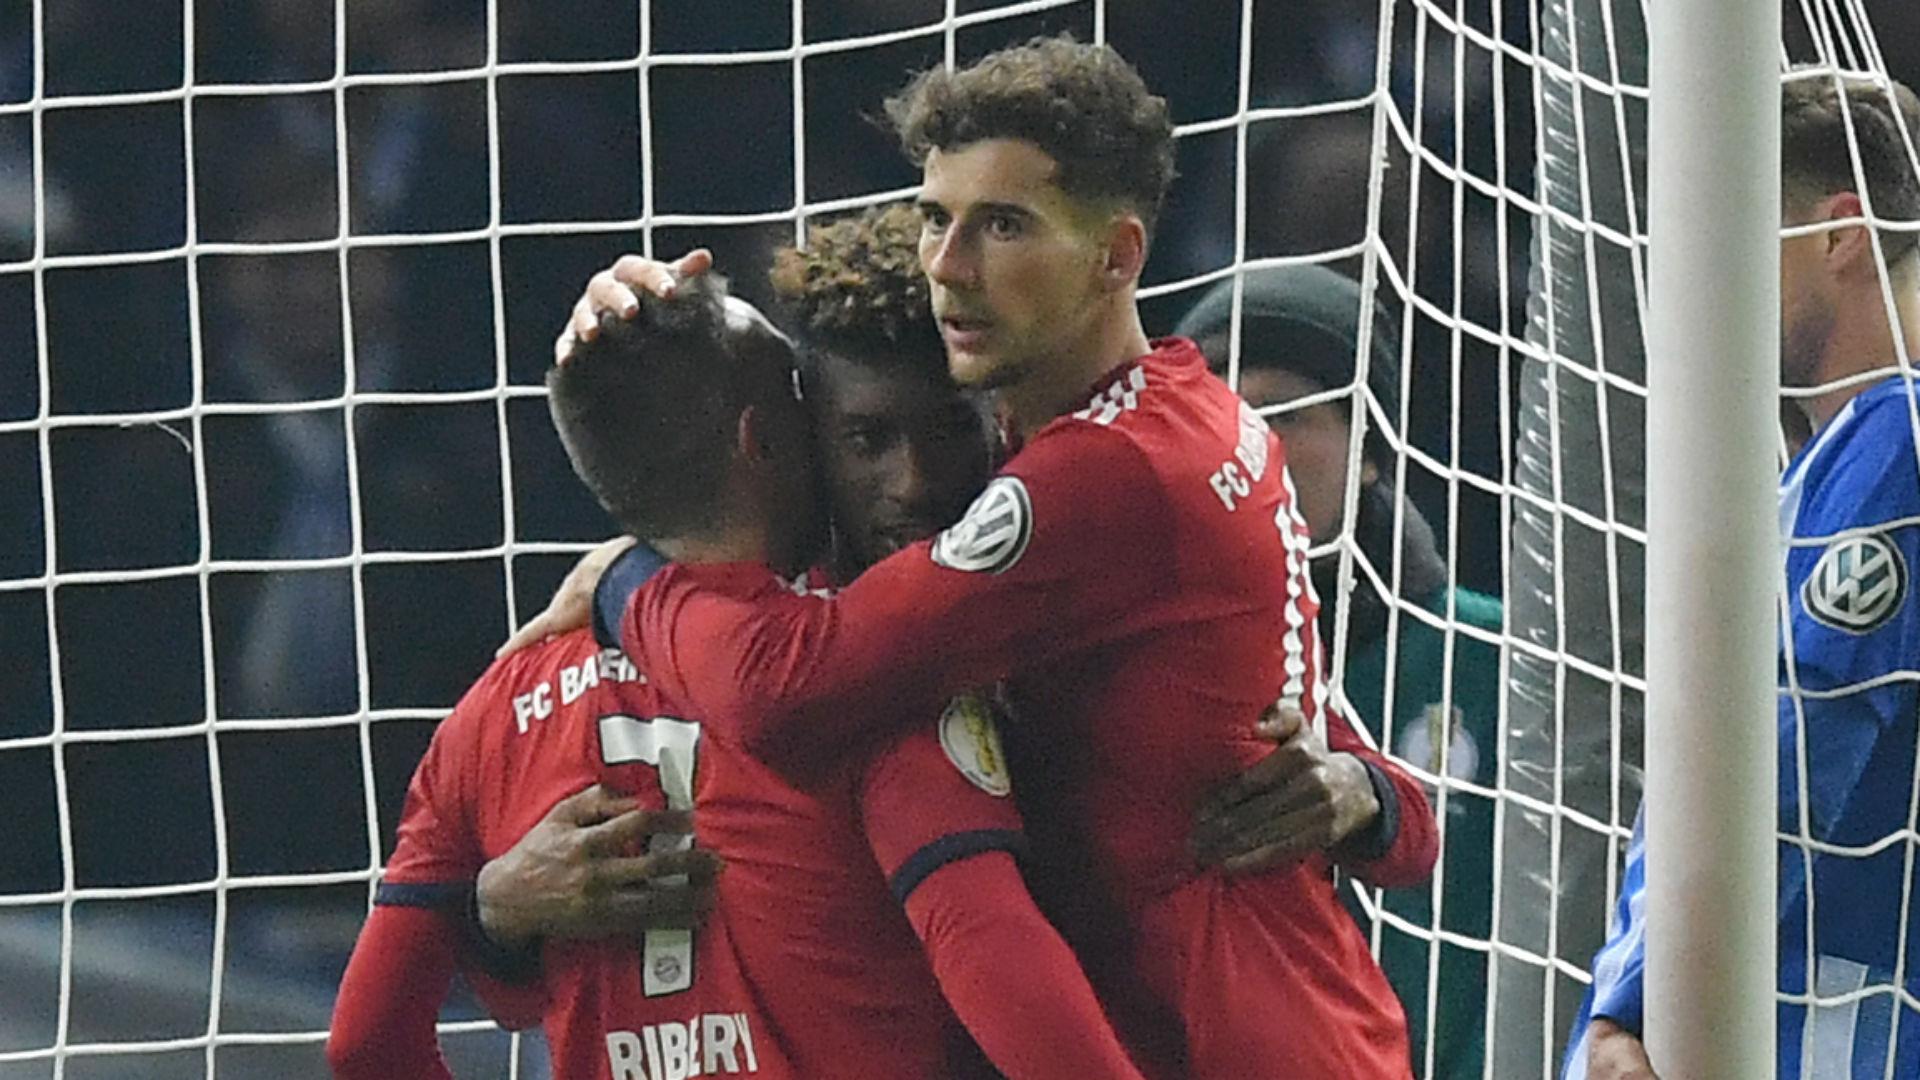 Hertha Berlin 2 Bayern Munich 3 (AET): Coman heads Bayern into quarters